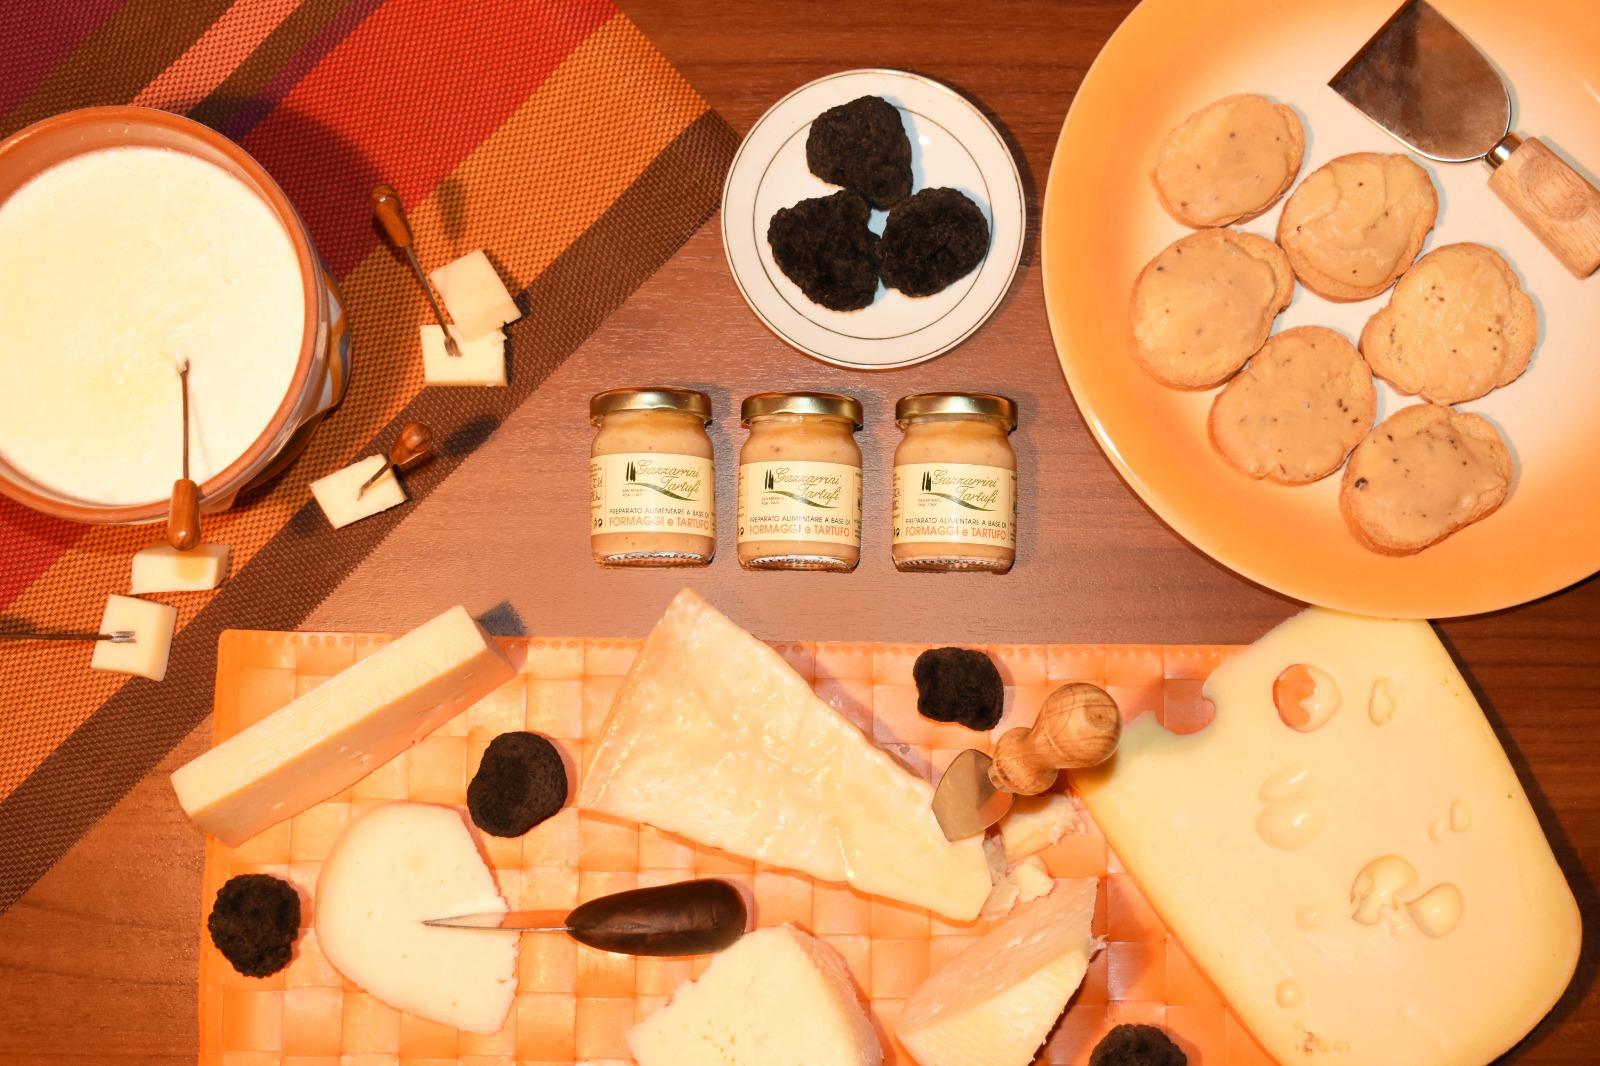 Crema 4 formaggi e tartufo; Parmigiano, Fontal, Emmenthal, Italico; tartufi di San Miniato; Gazzarrini Tartufi; Tartufi;